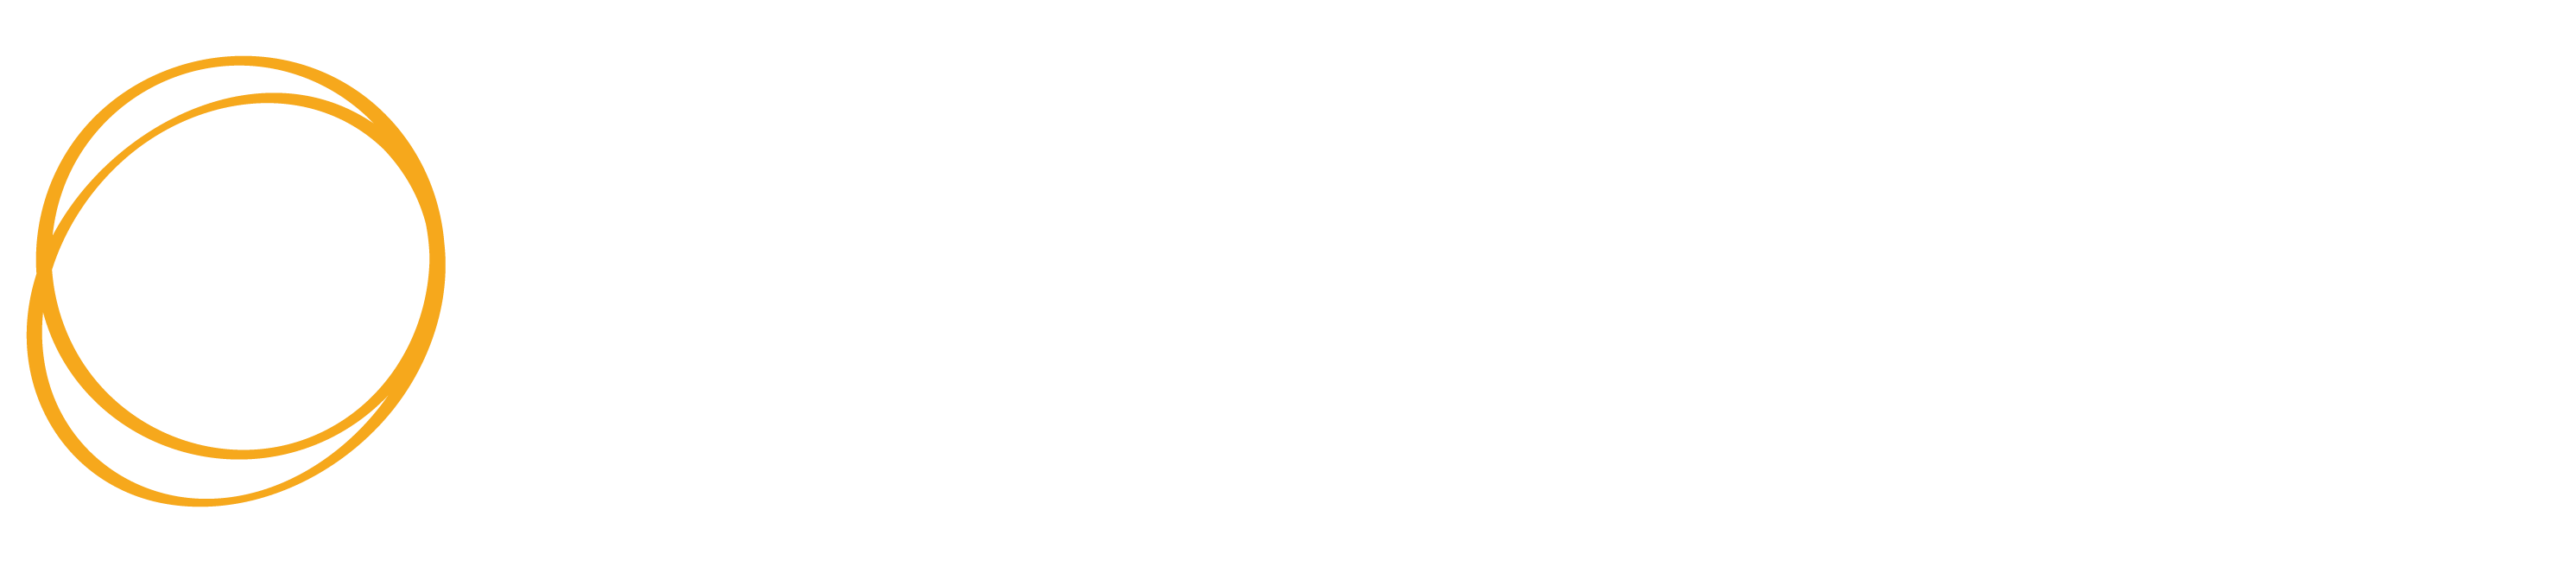 Chin & Curtis